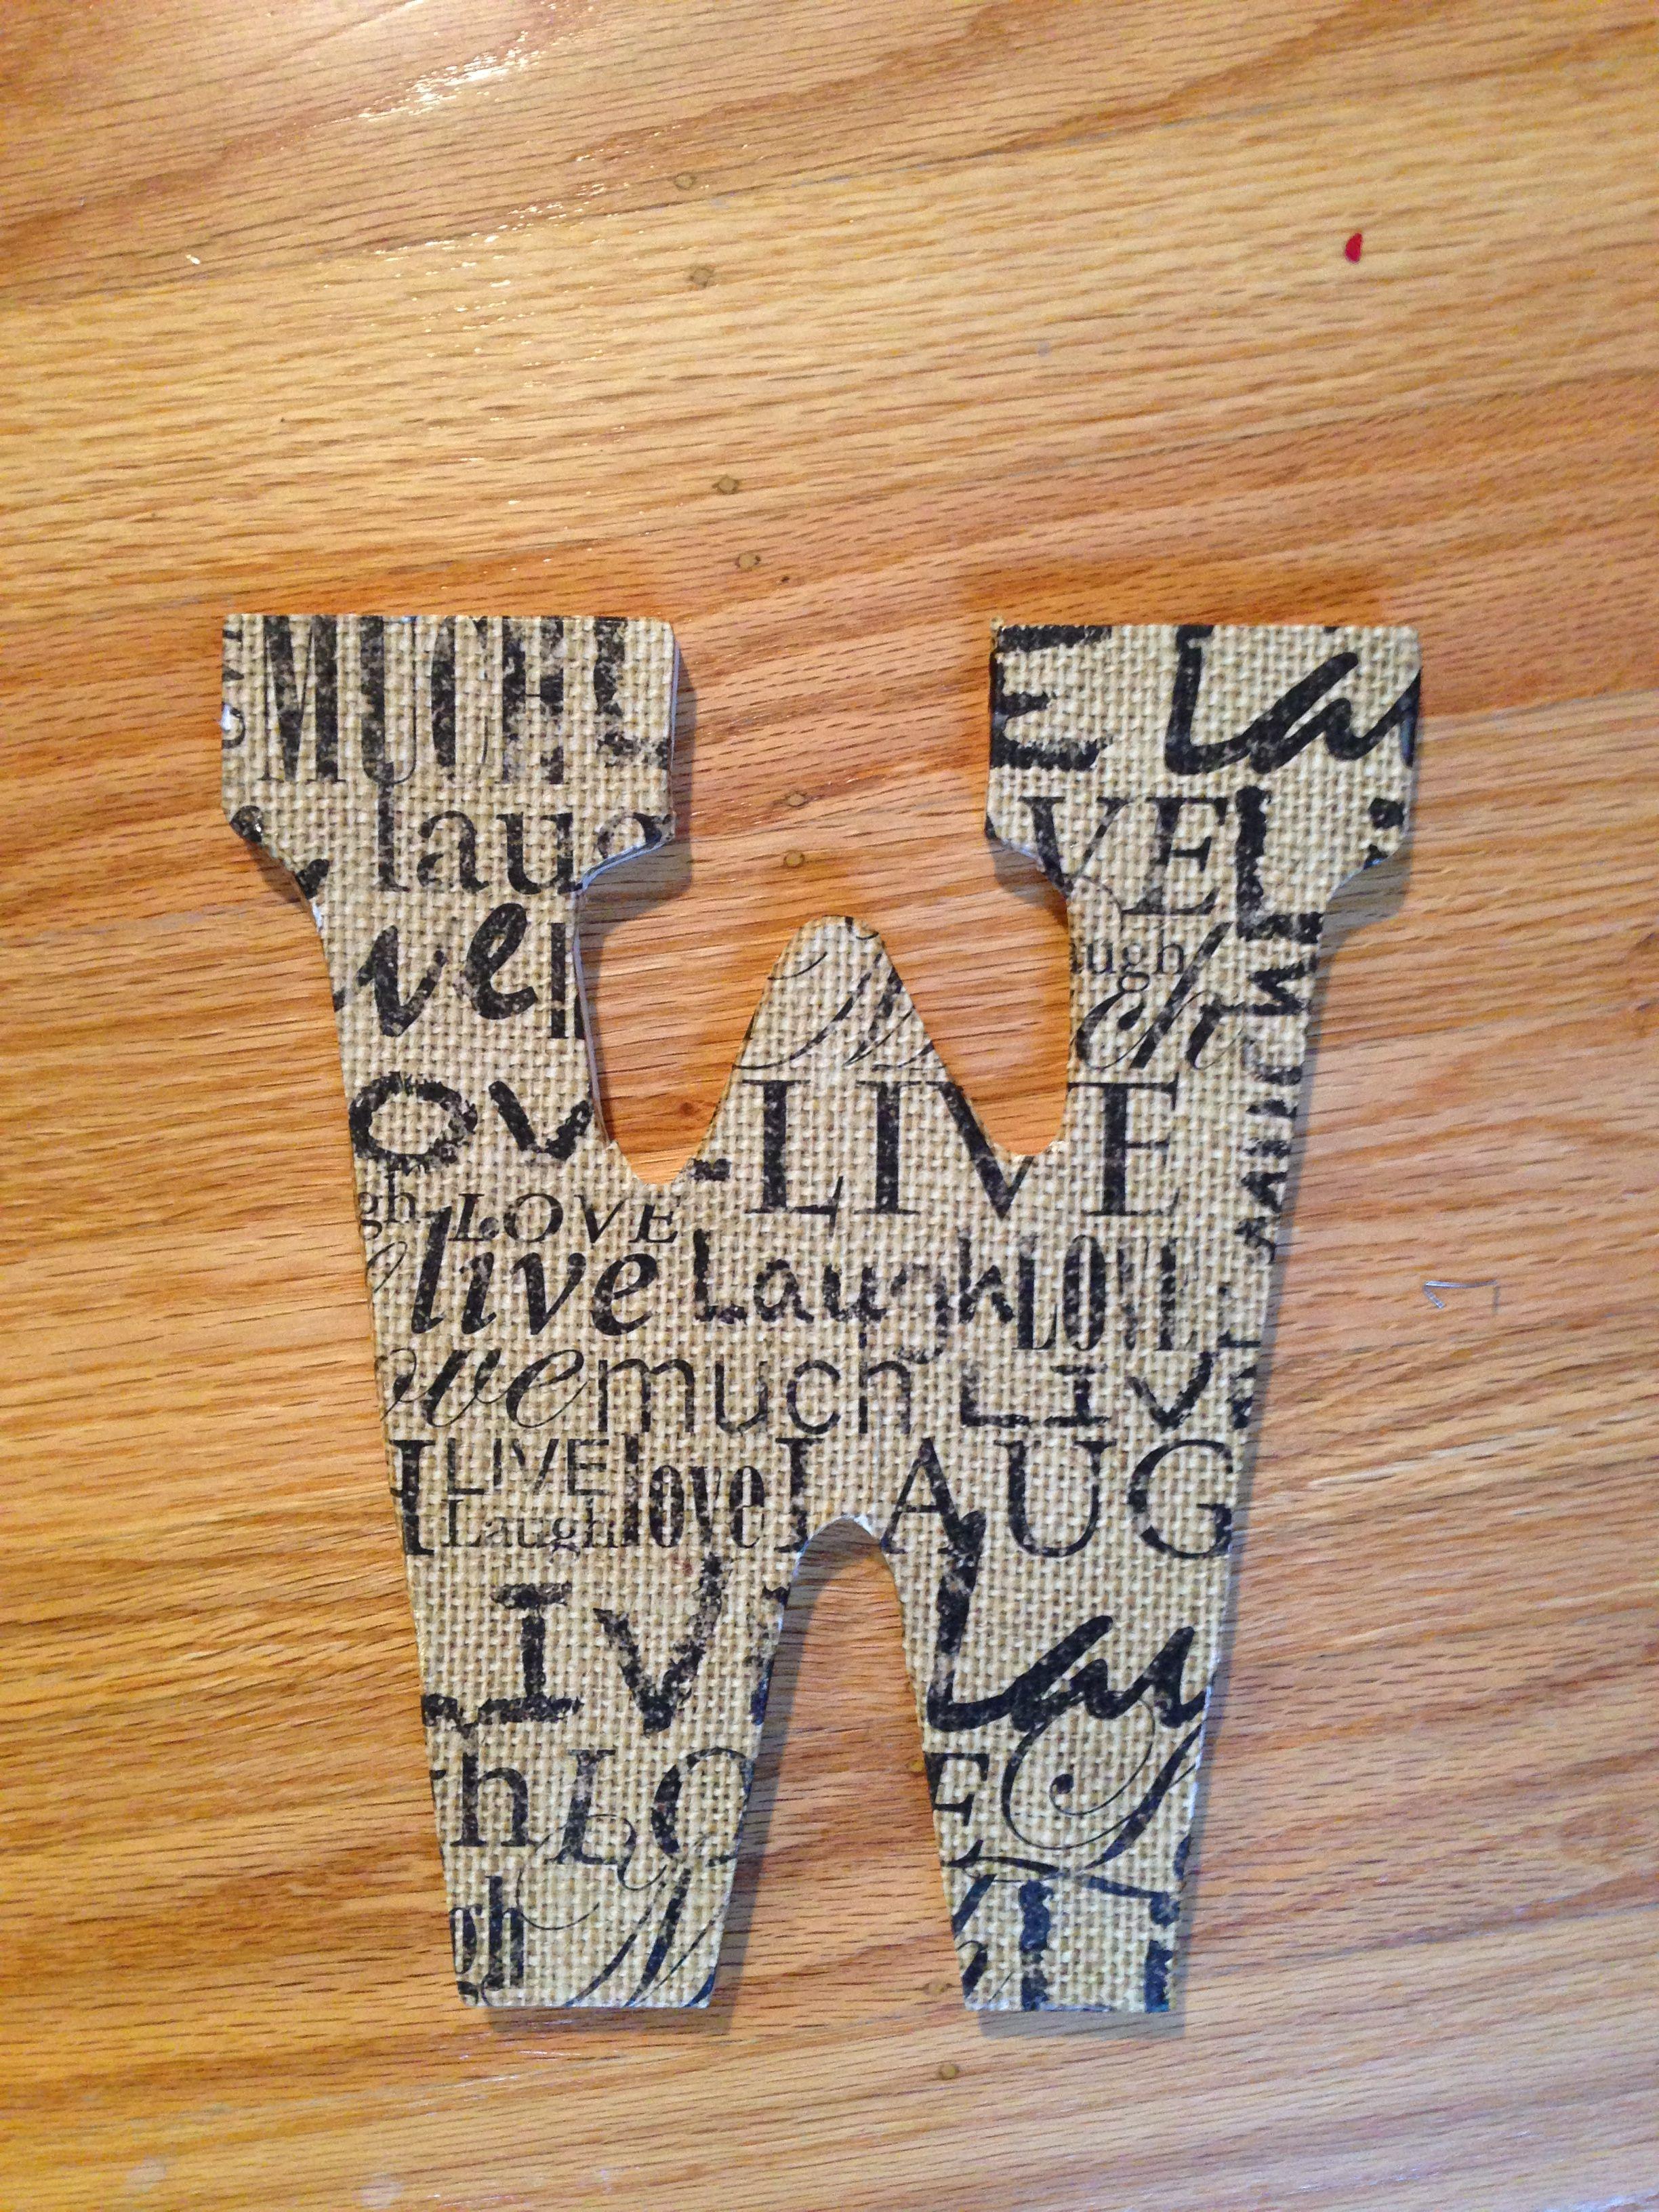 13+ Big letter stencils michaels inspirations